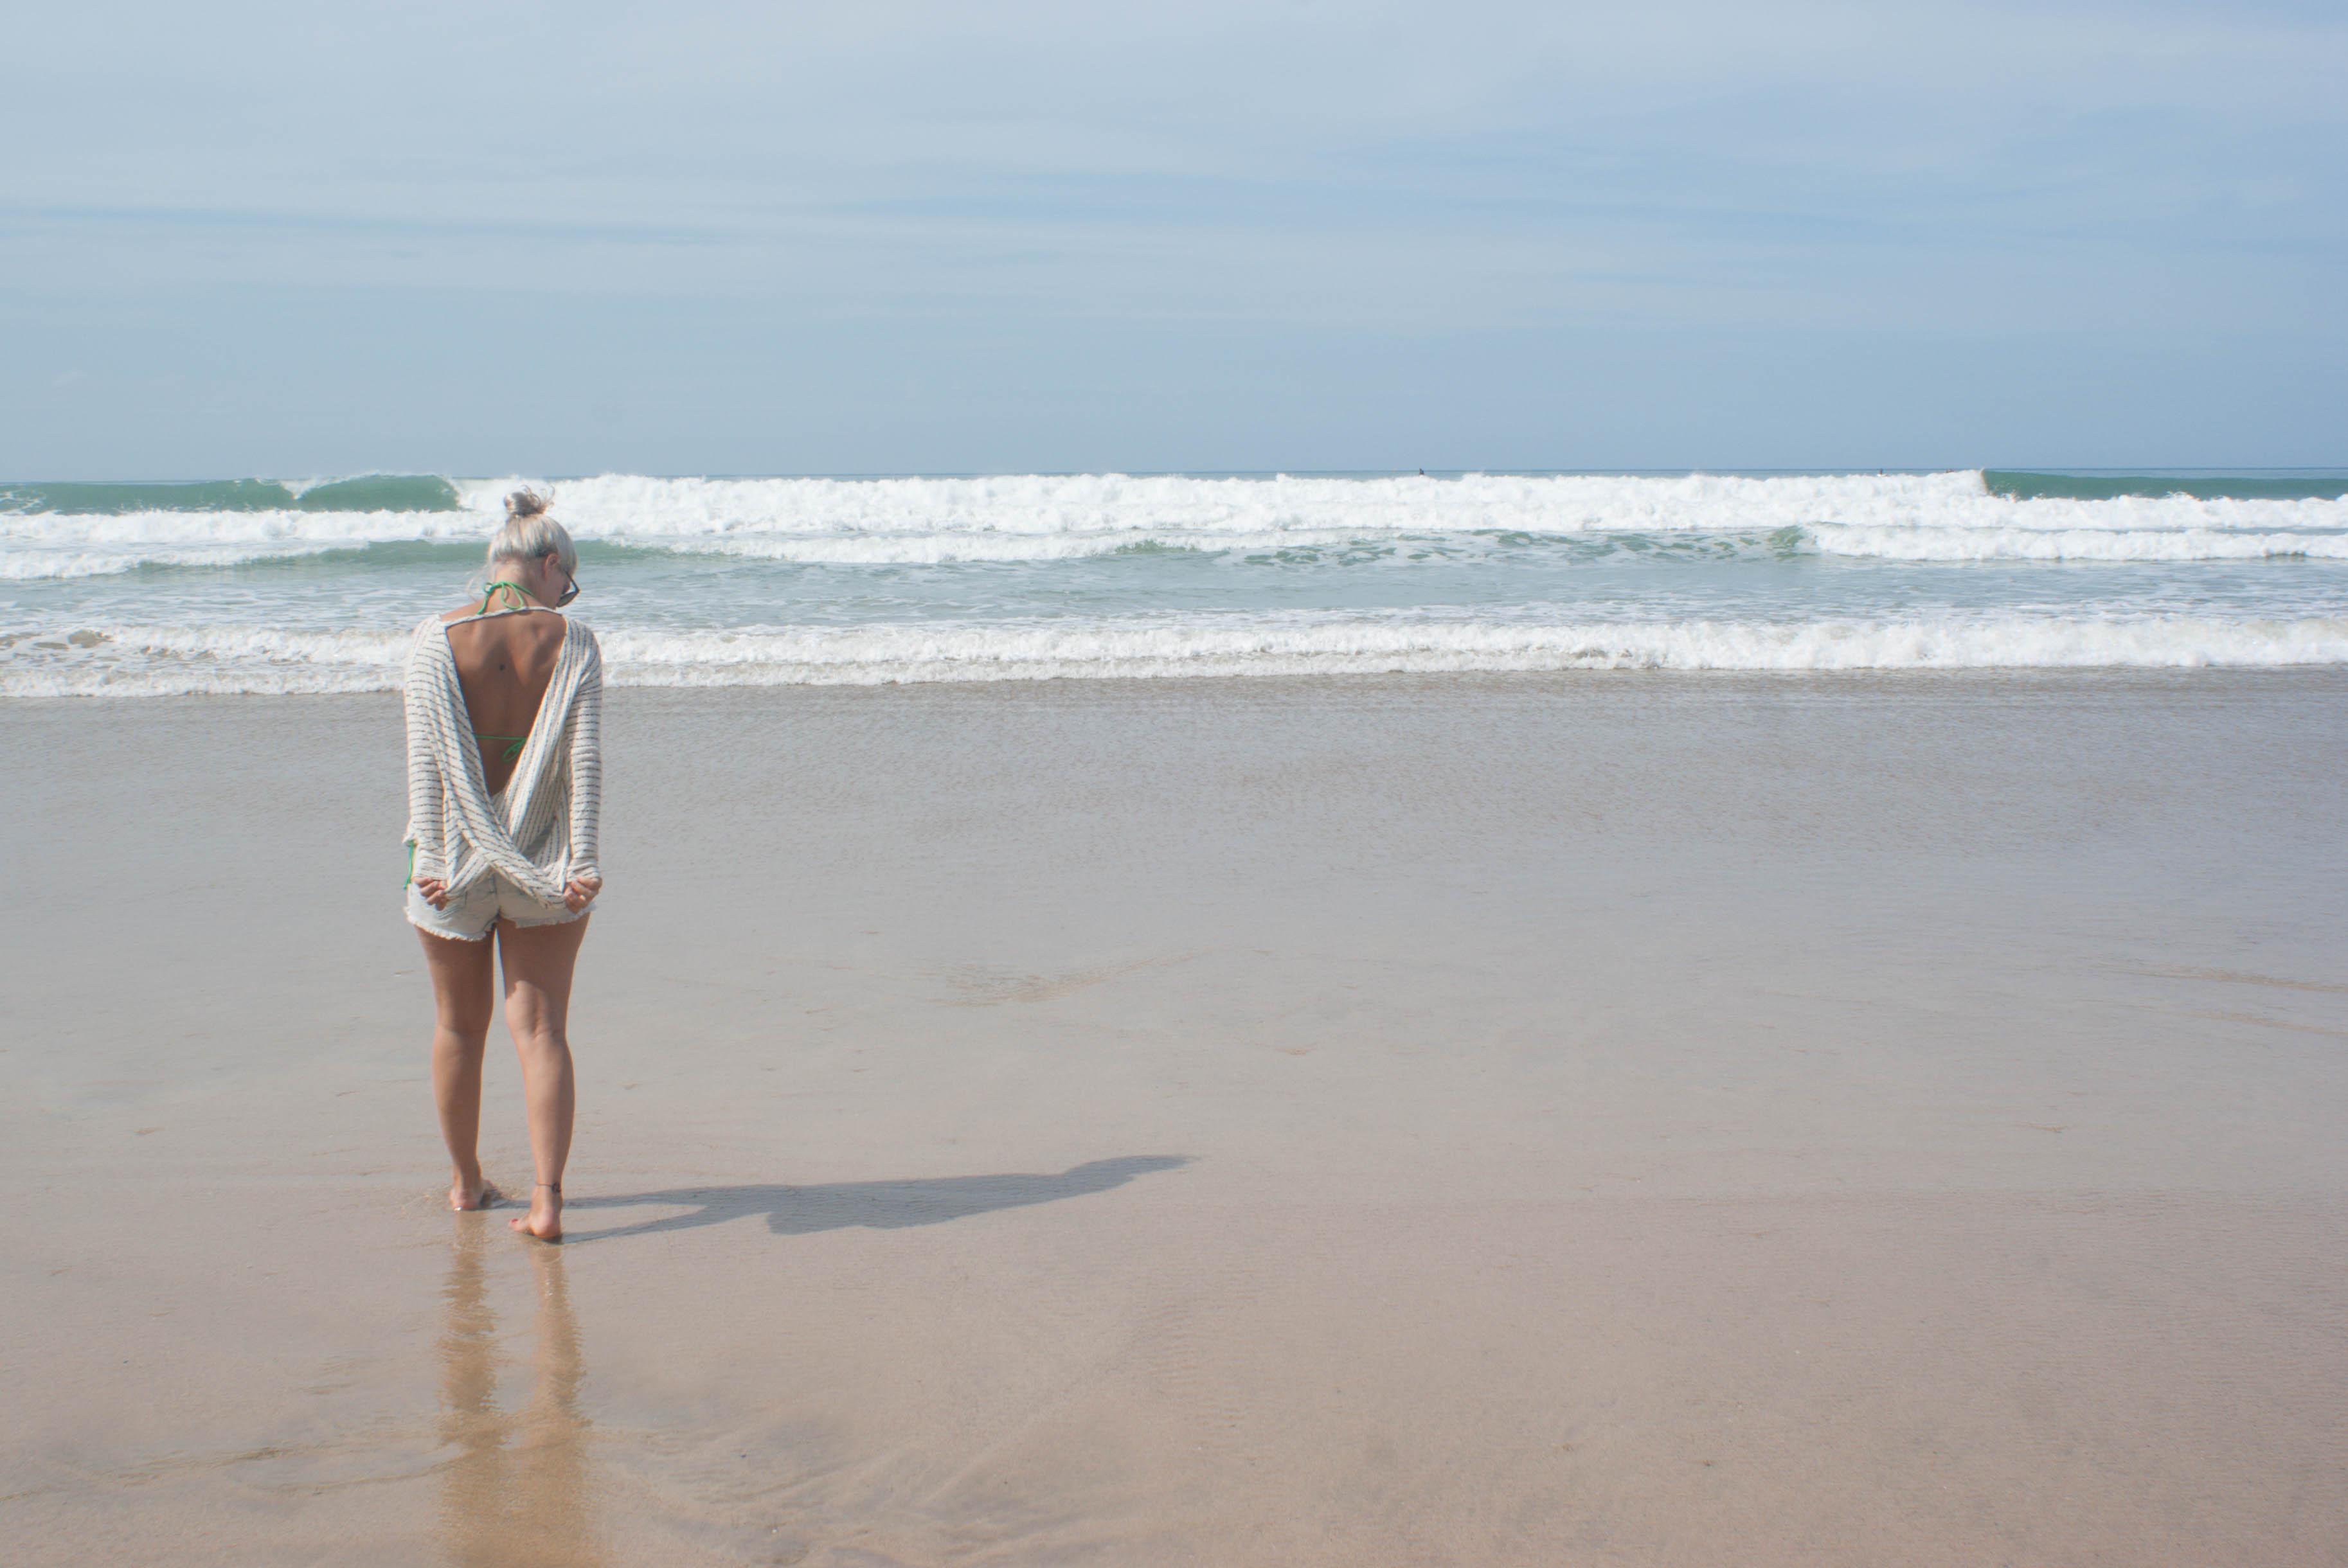 Cornwall Sommerurlaub